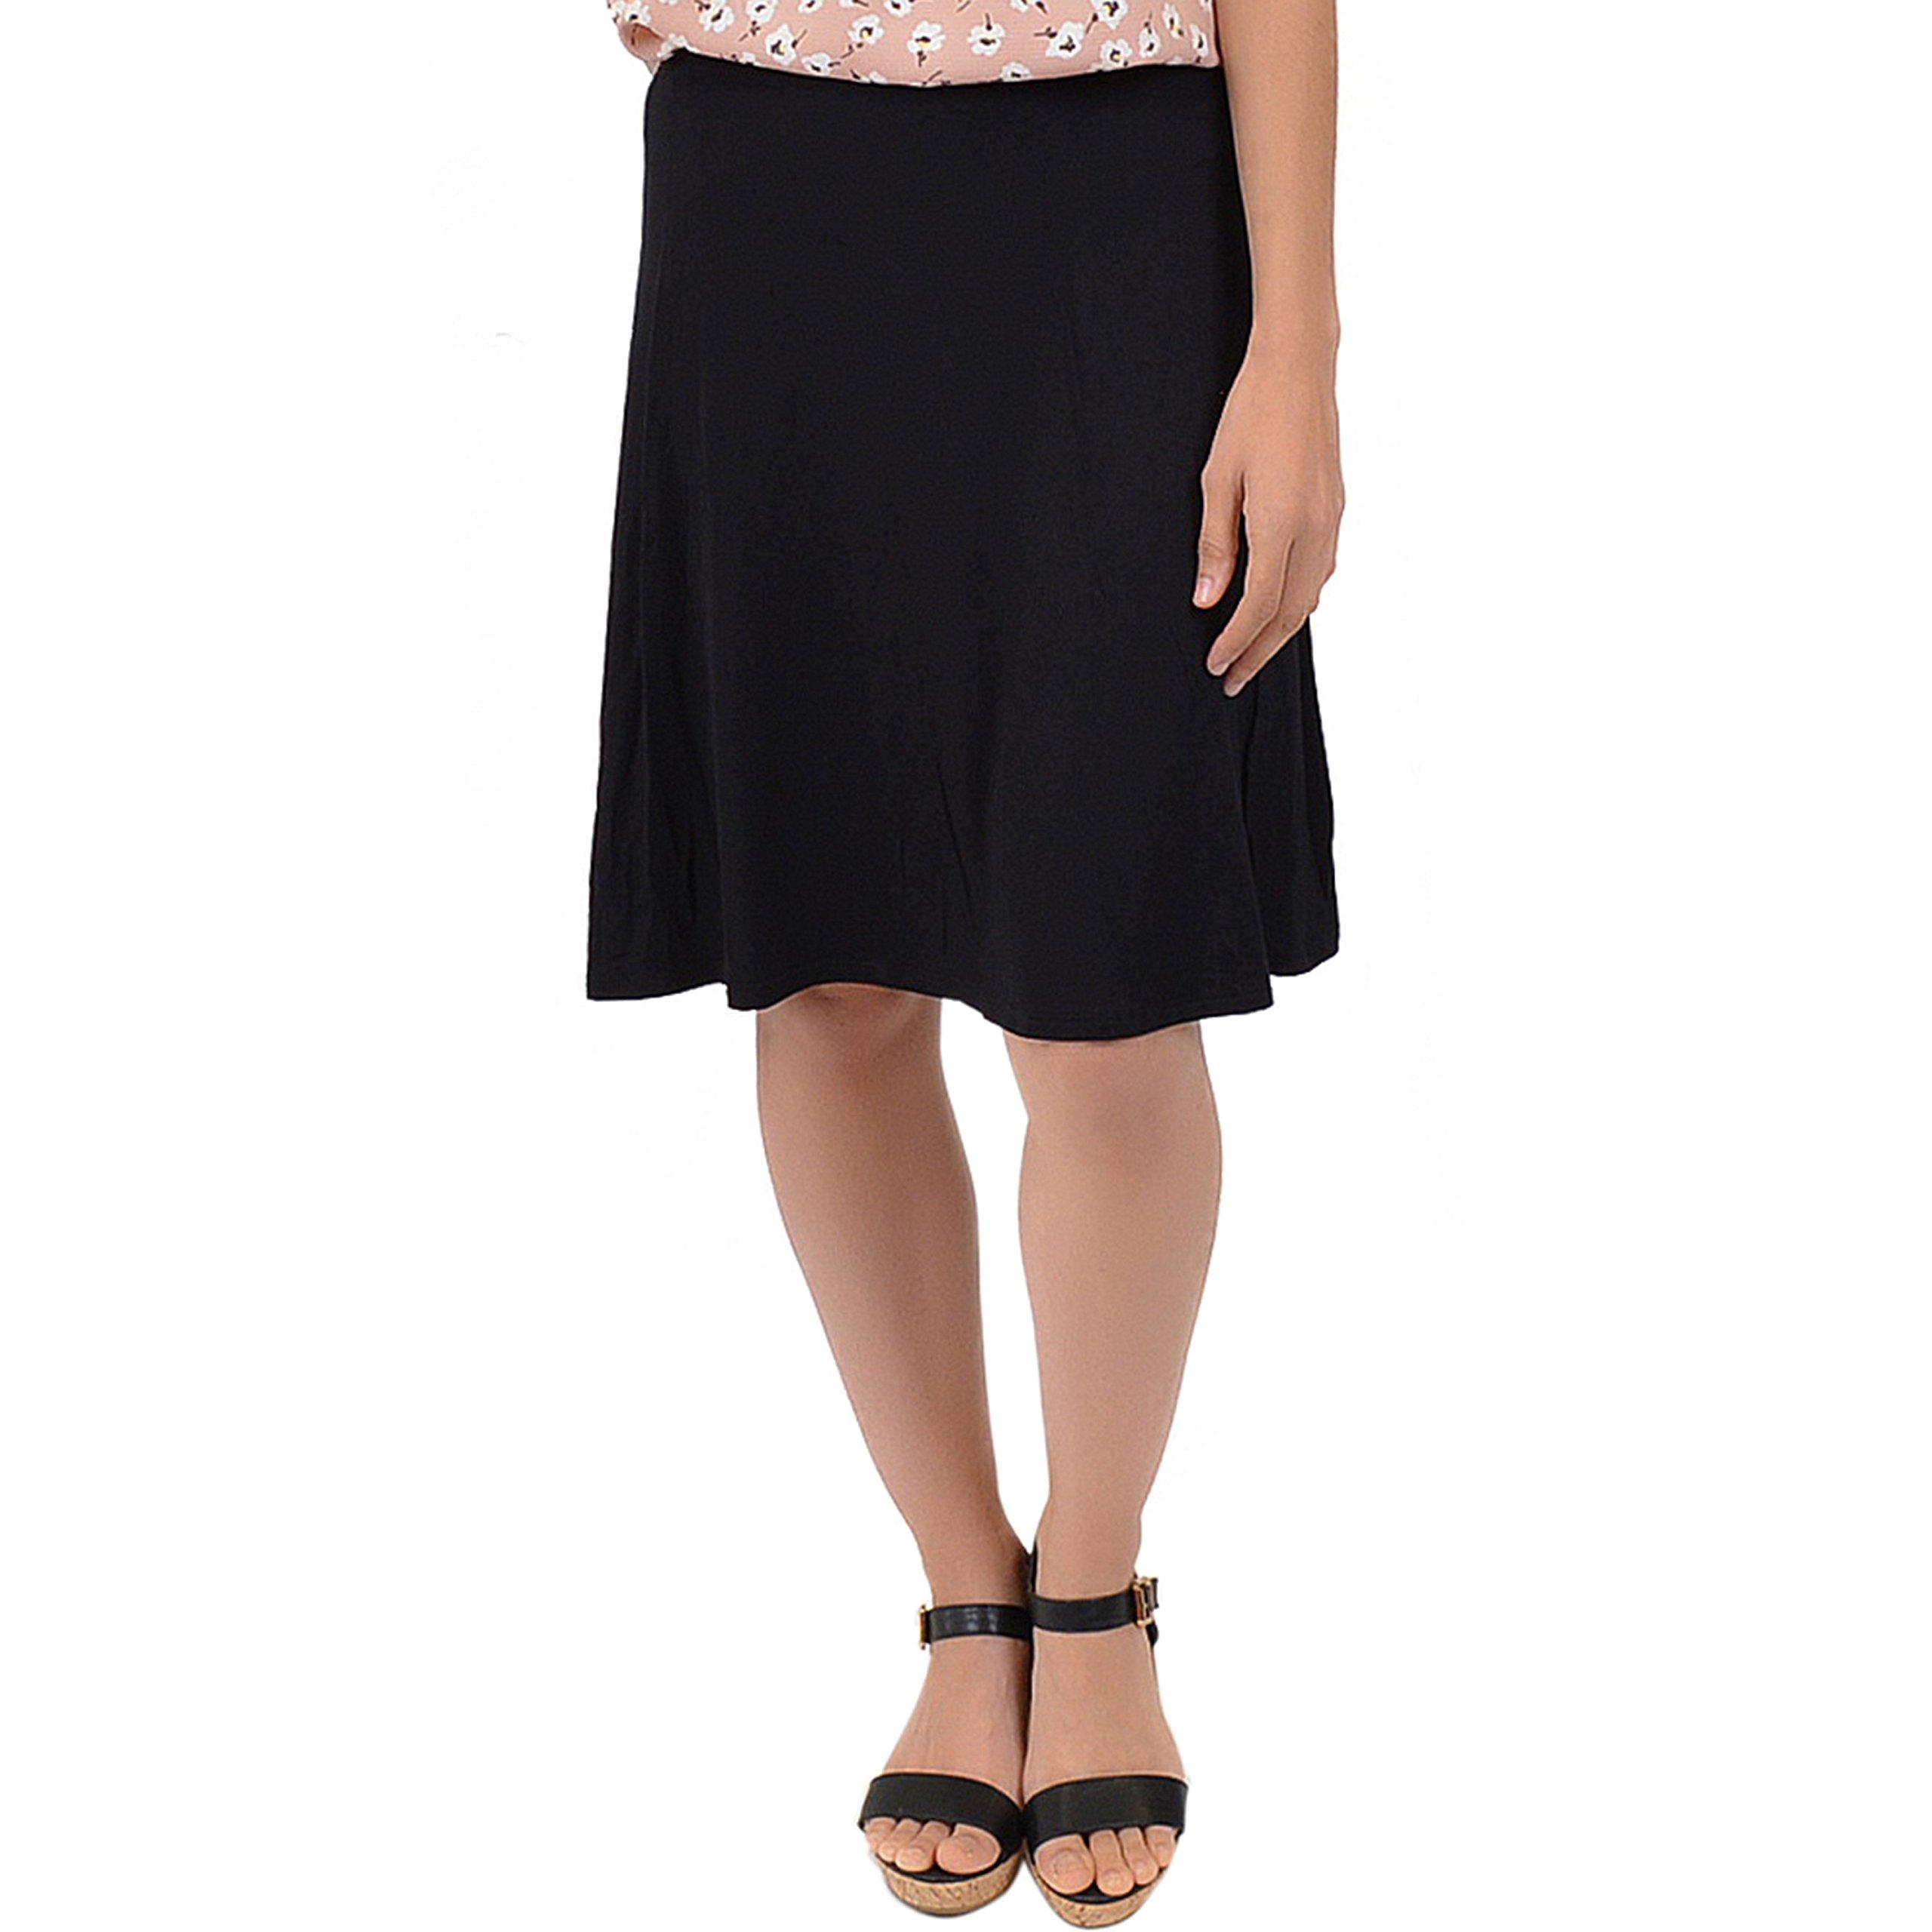 Stretch is Comfort Women's A-Line Skirt Black Medium